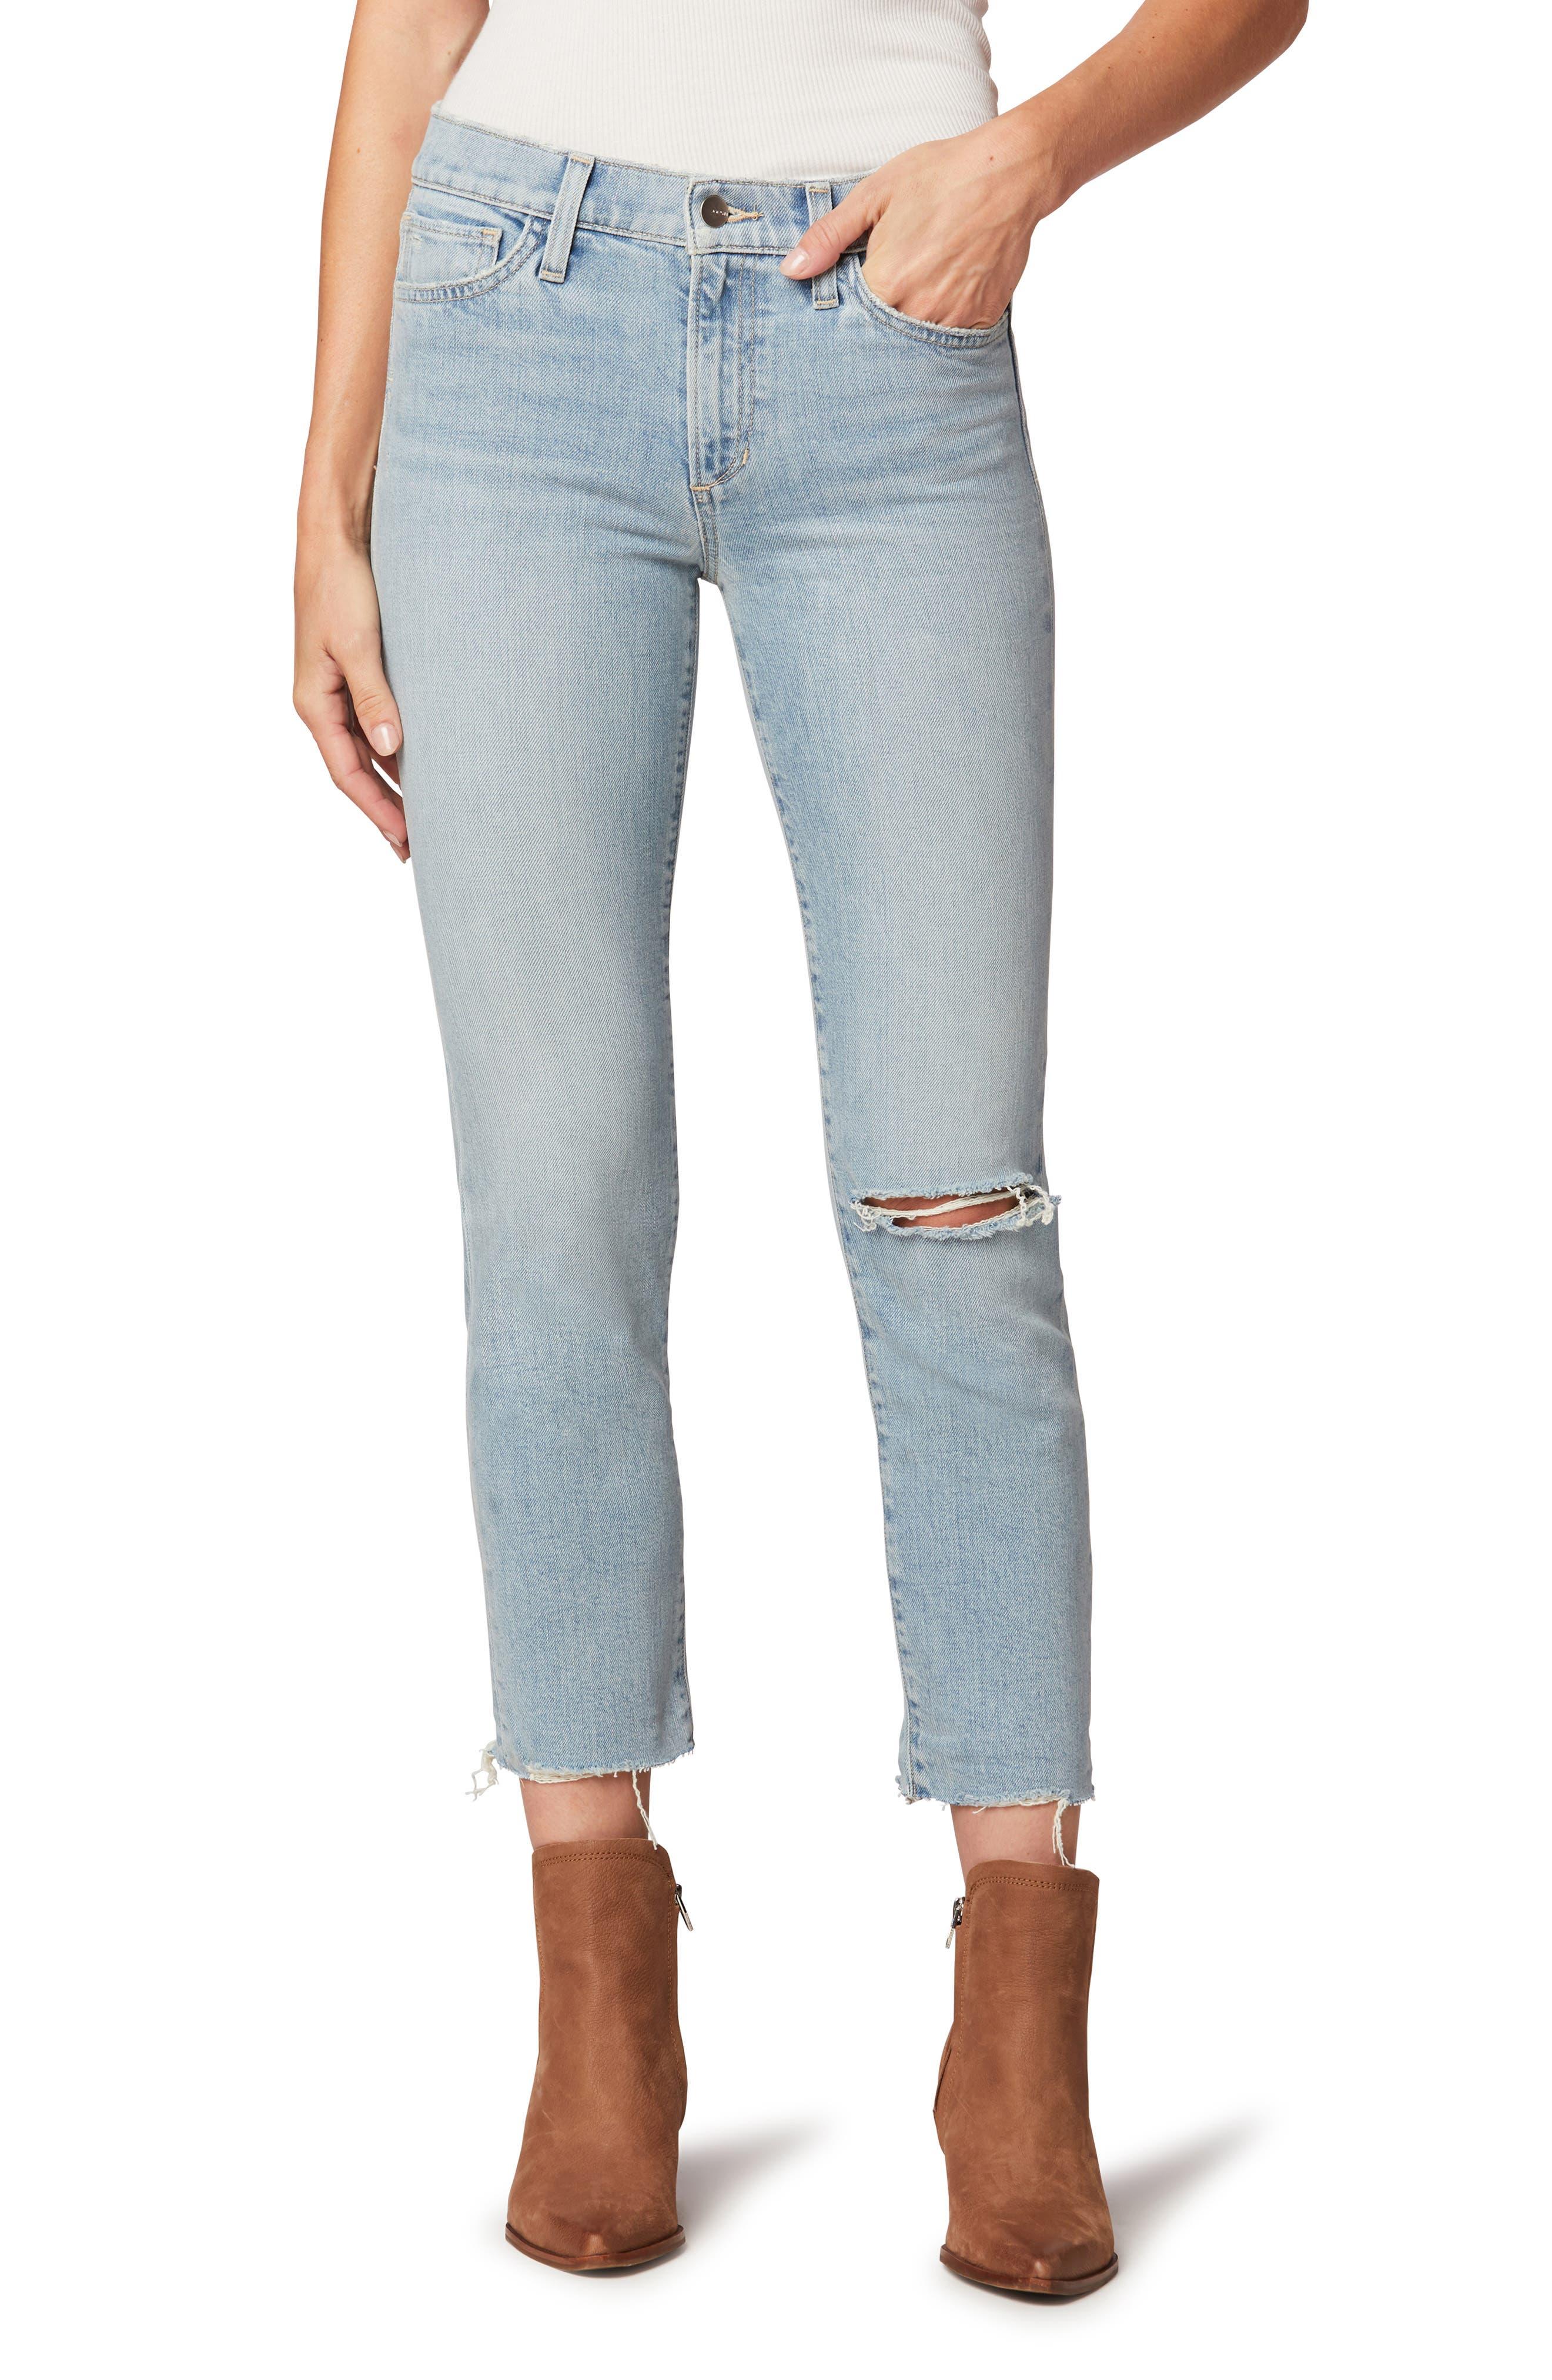 The Lara Crop Straight Leg Jeans